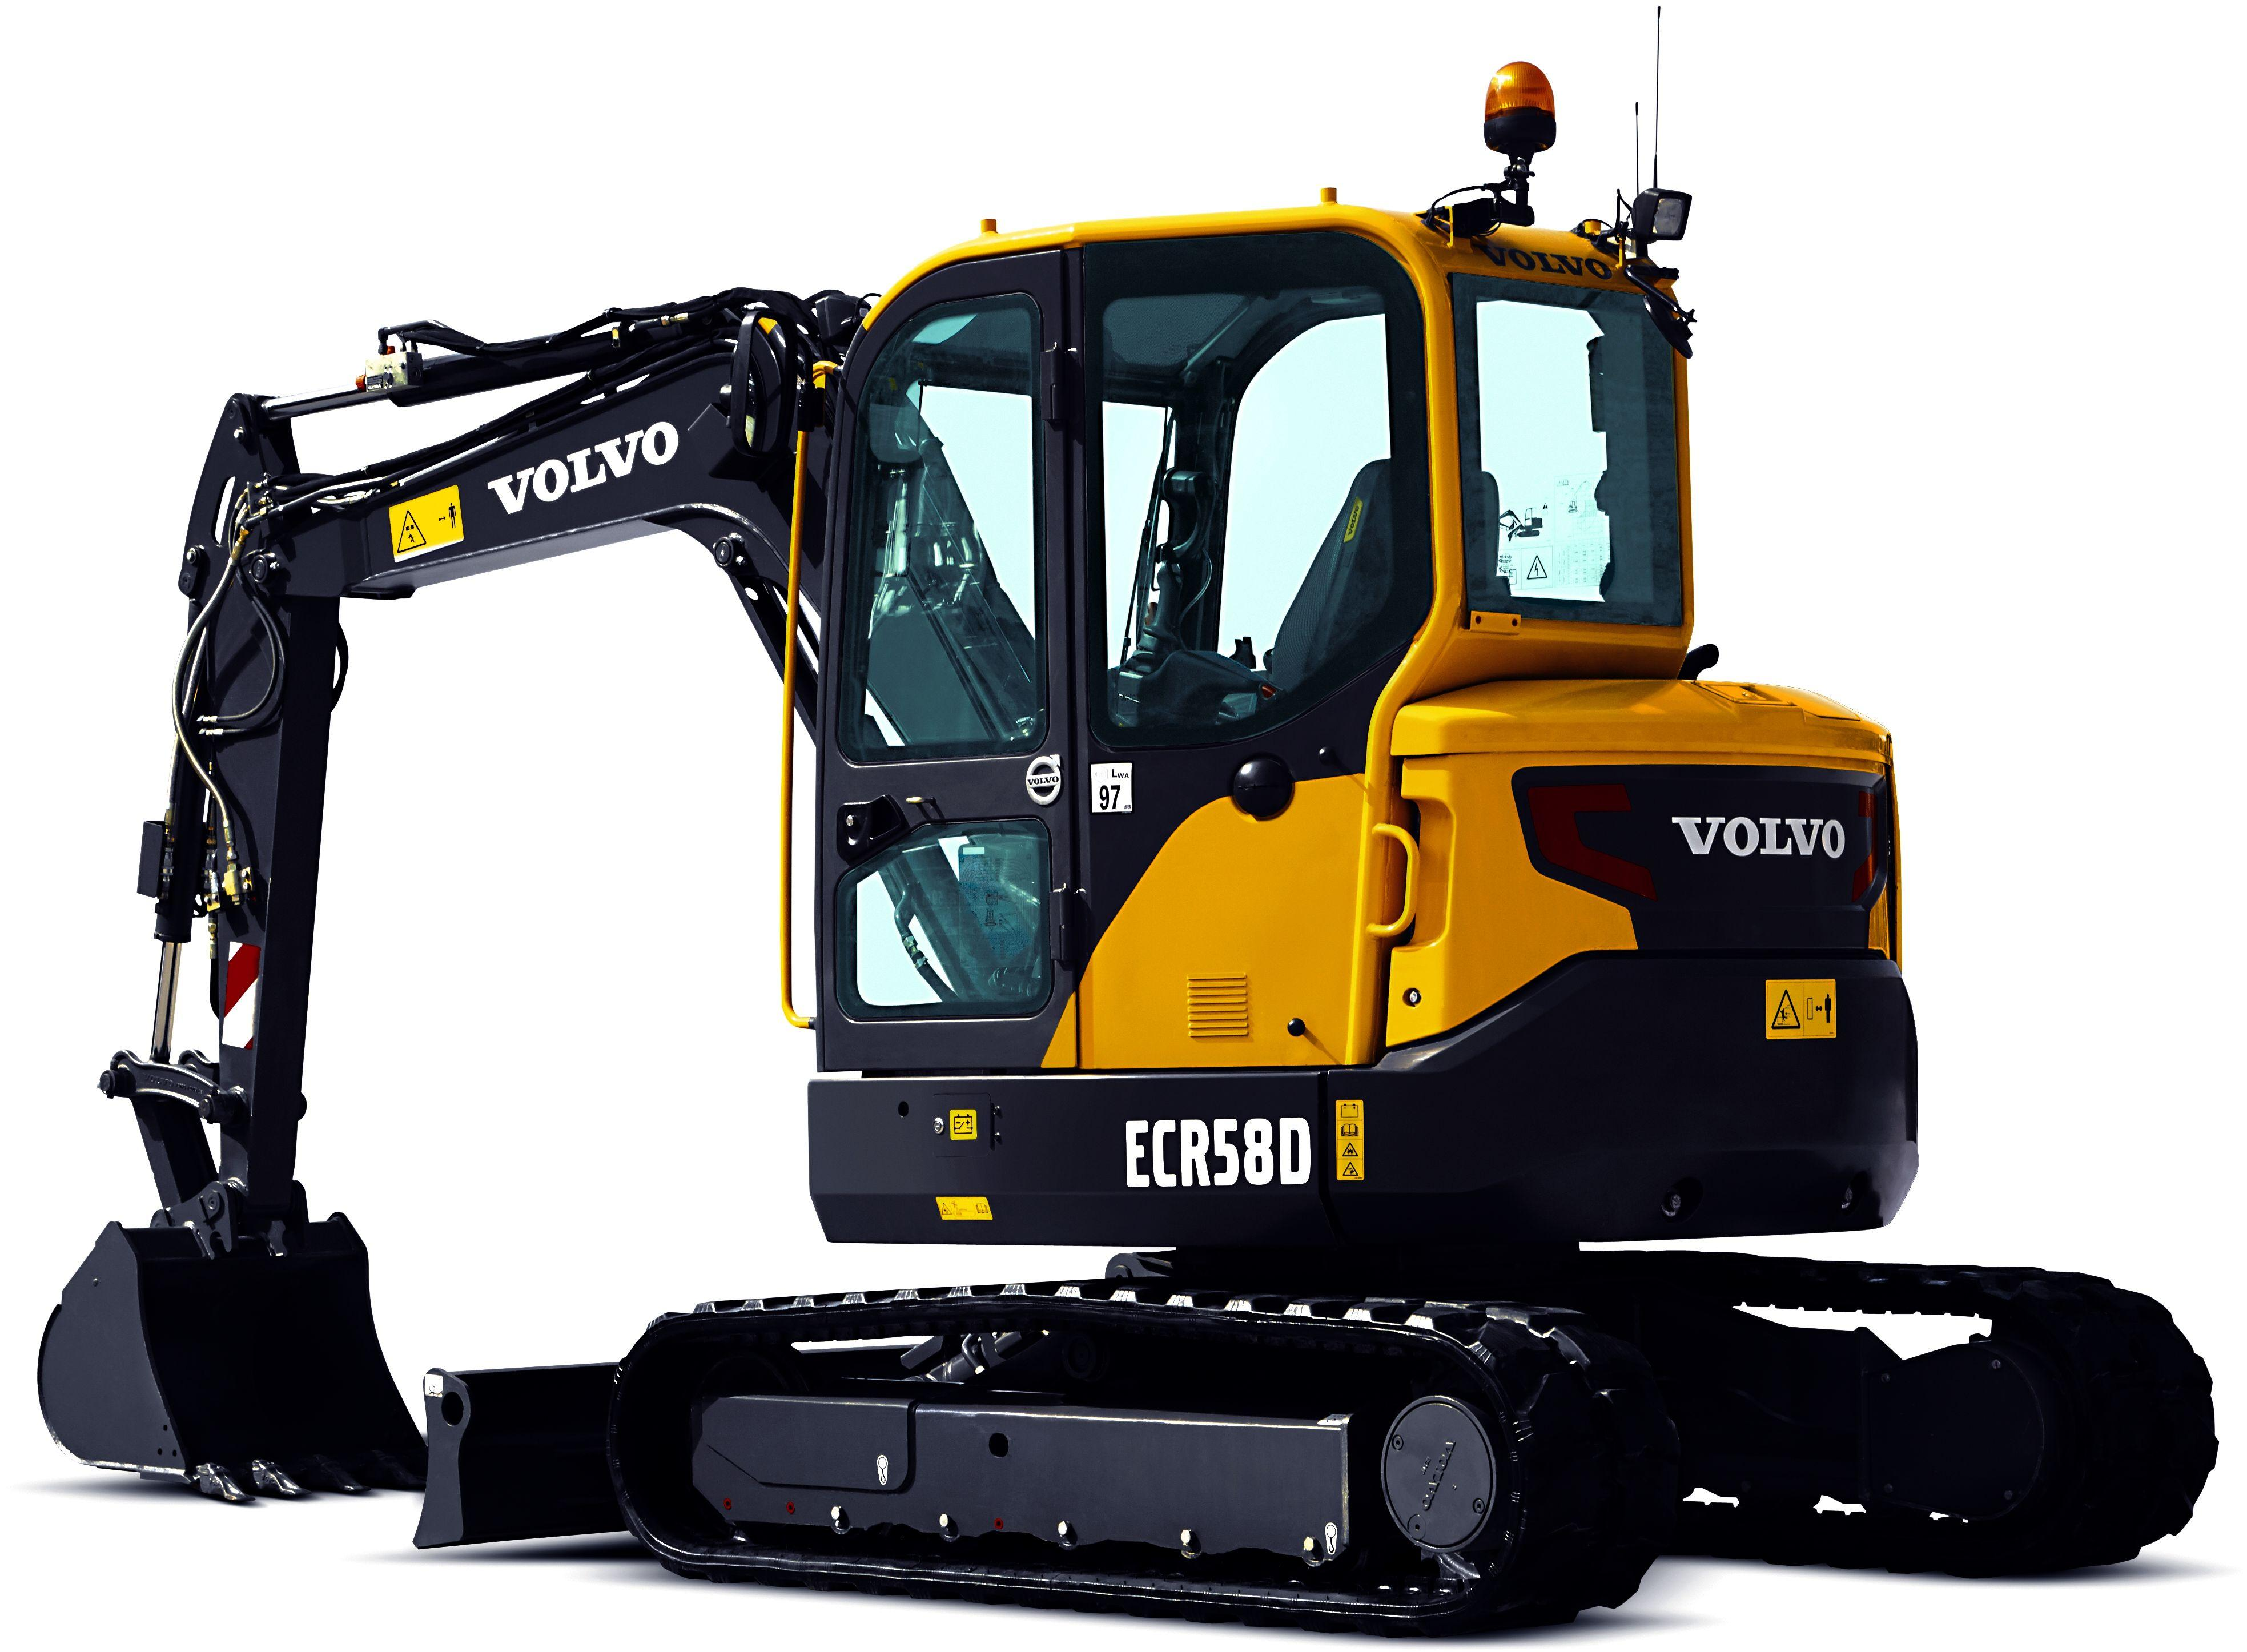 Volvo Ecr58    Ecr58d Compact Excavators Service Repair